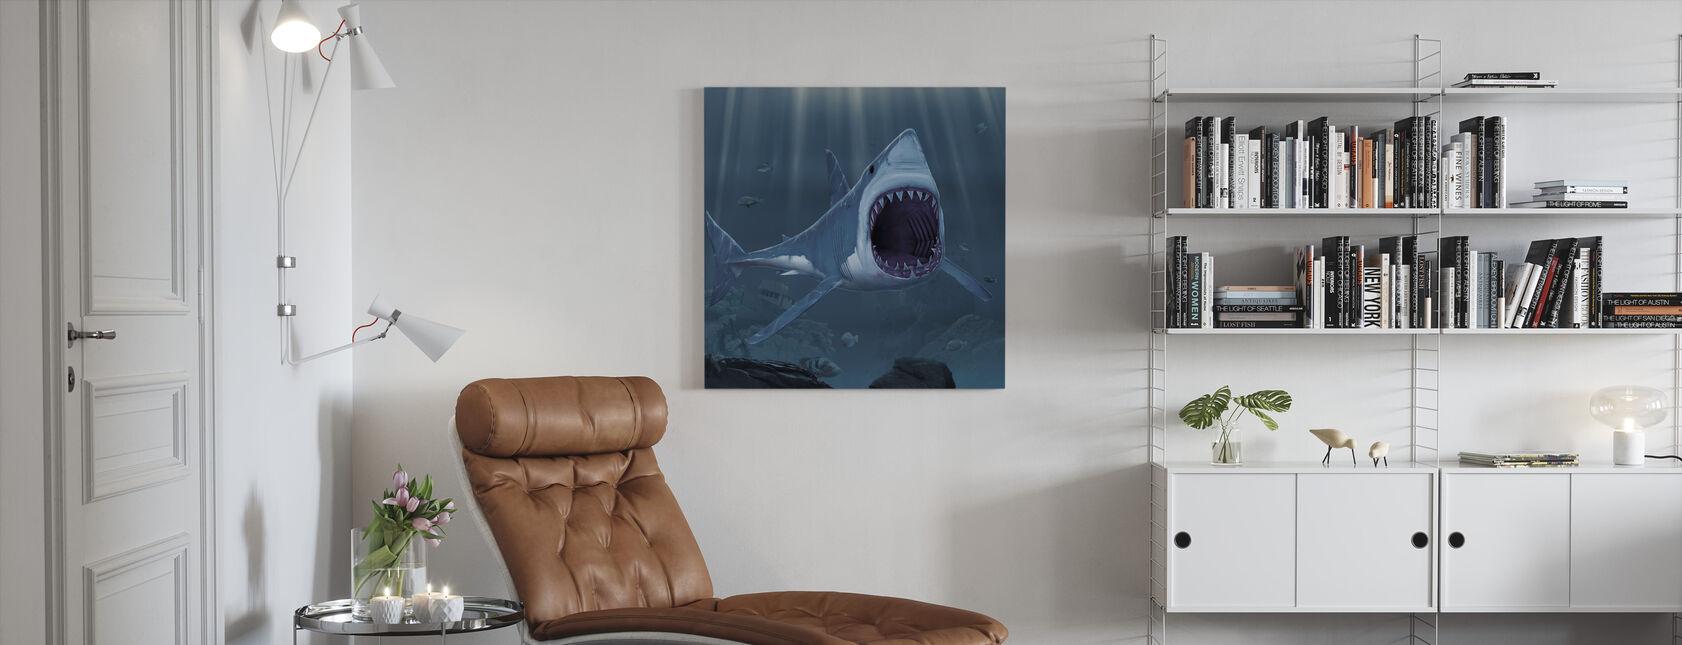 Haaienbeet - Canvas print - Woonkamer